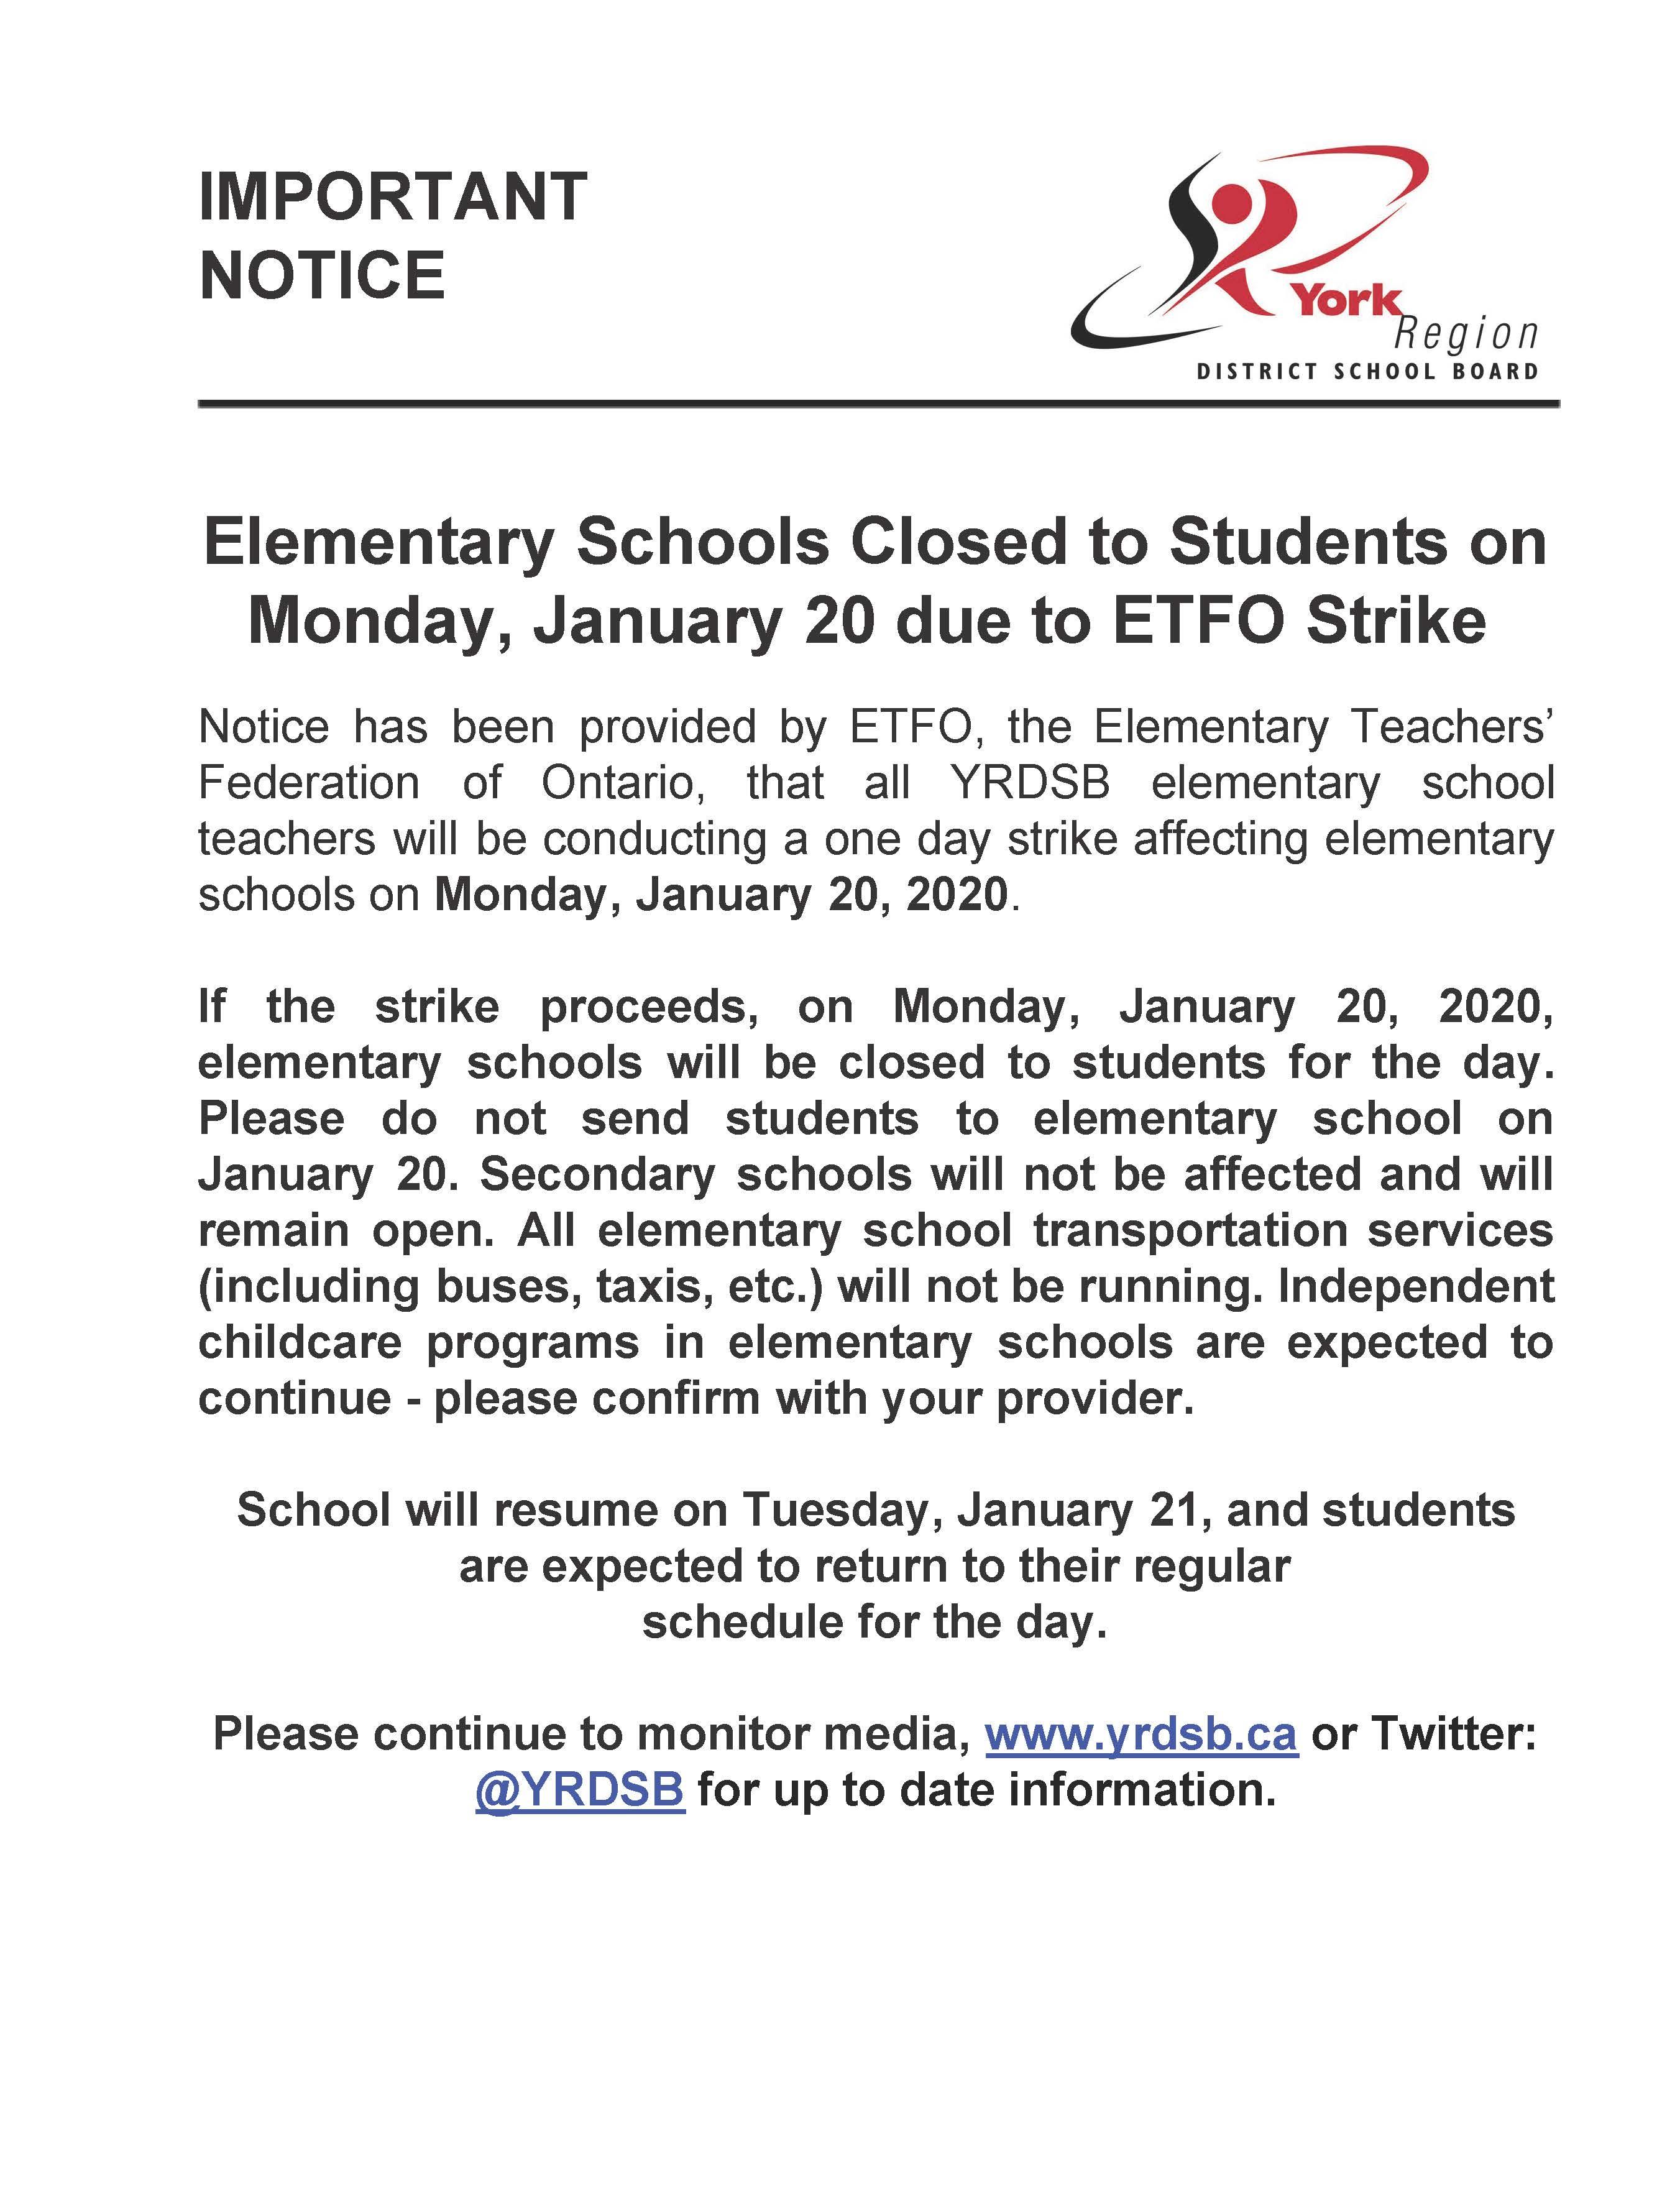 ETFO Strike- Schools closed Monday, Jan 20